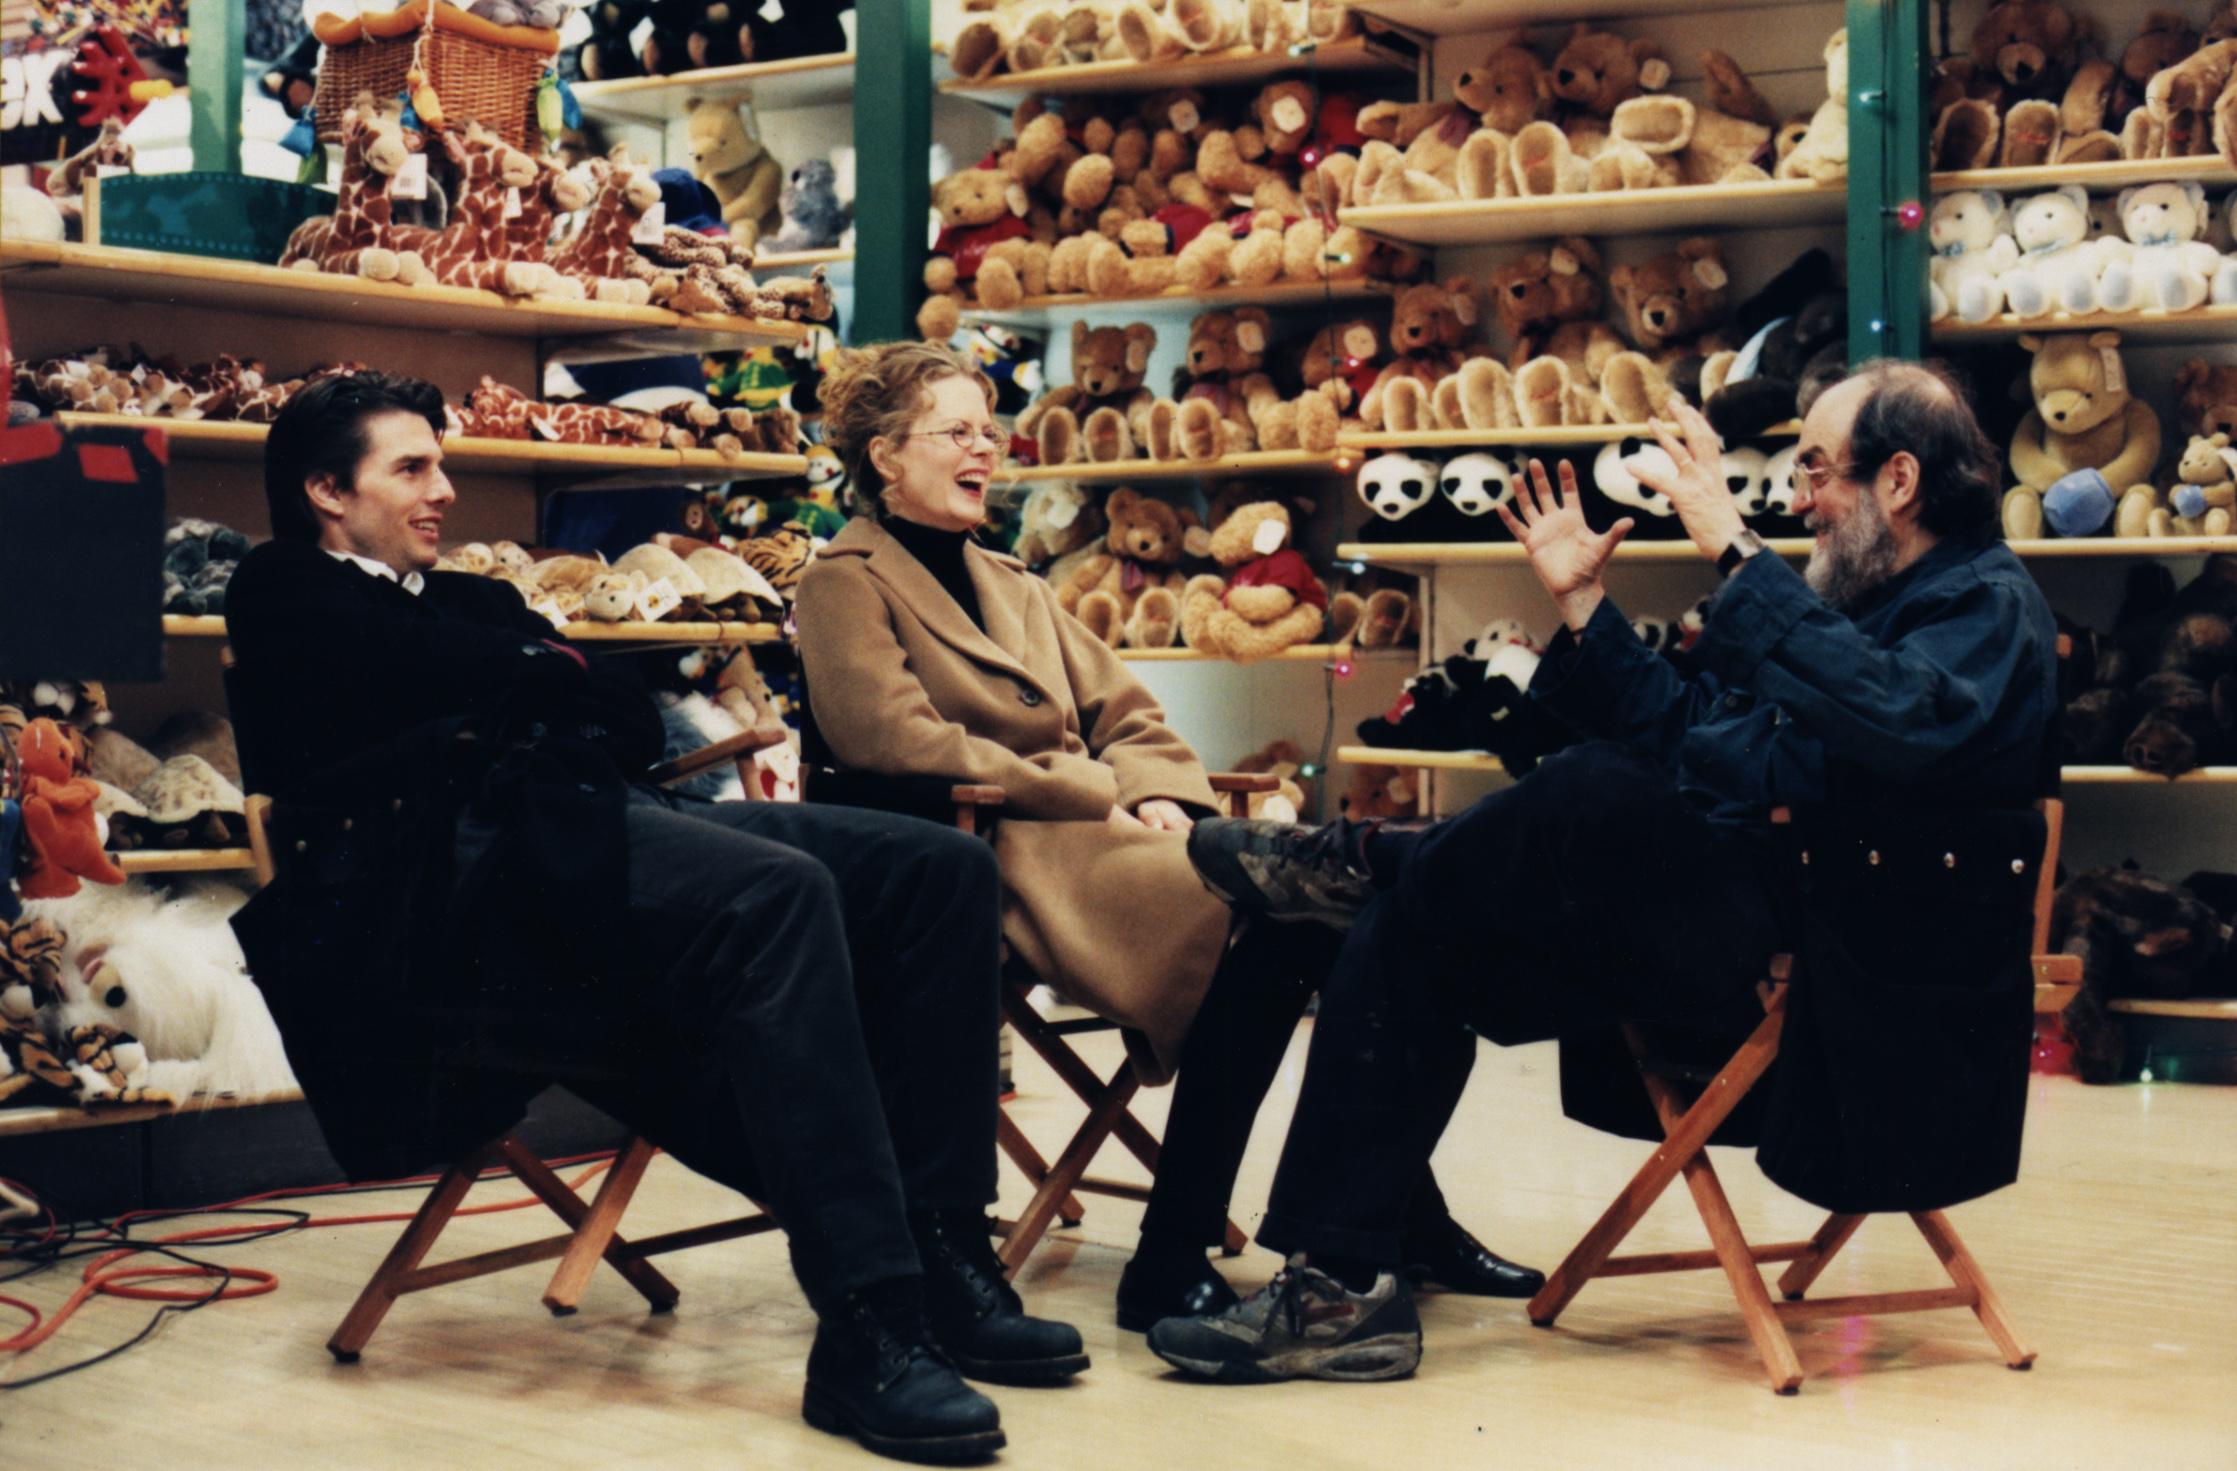 Cruise, Kidman, & Kubrick, on the set of the last scene in  Eyes Wide Shut  —  Image via    scrapsfromtheloft.com